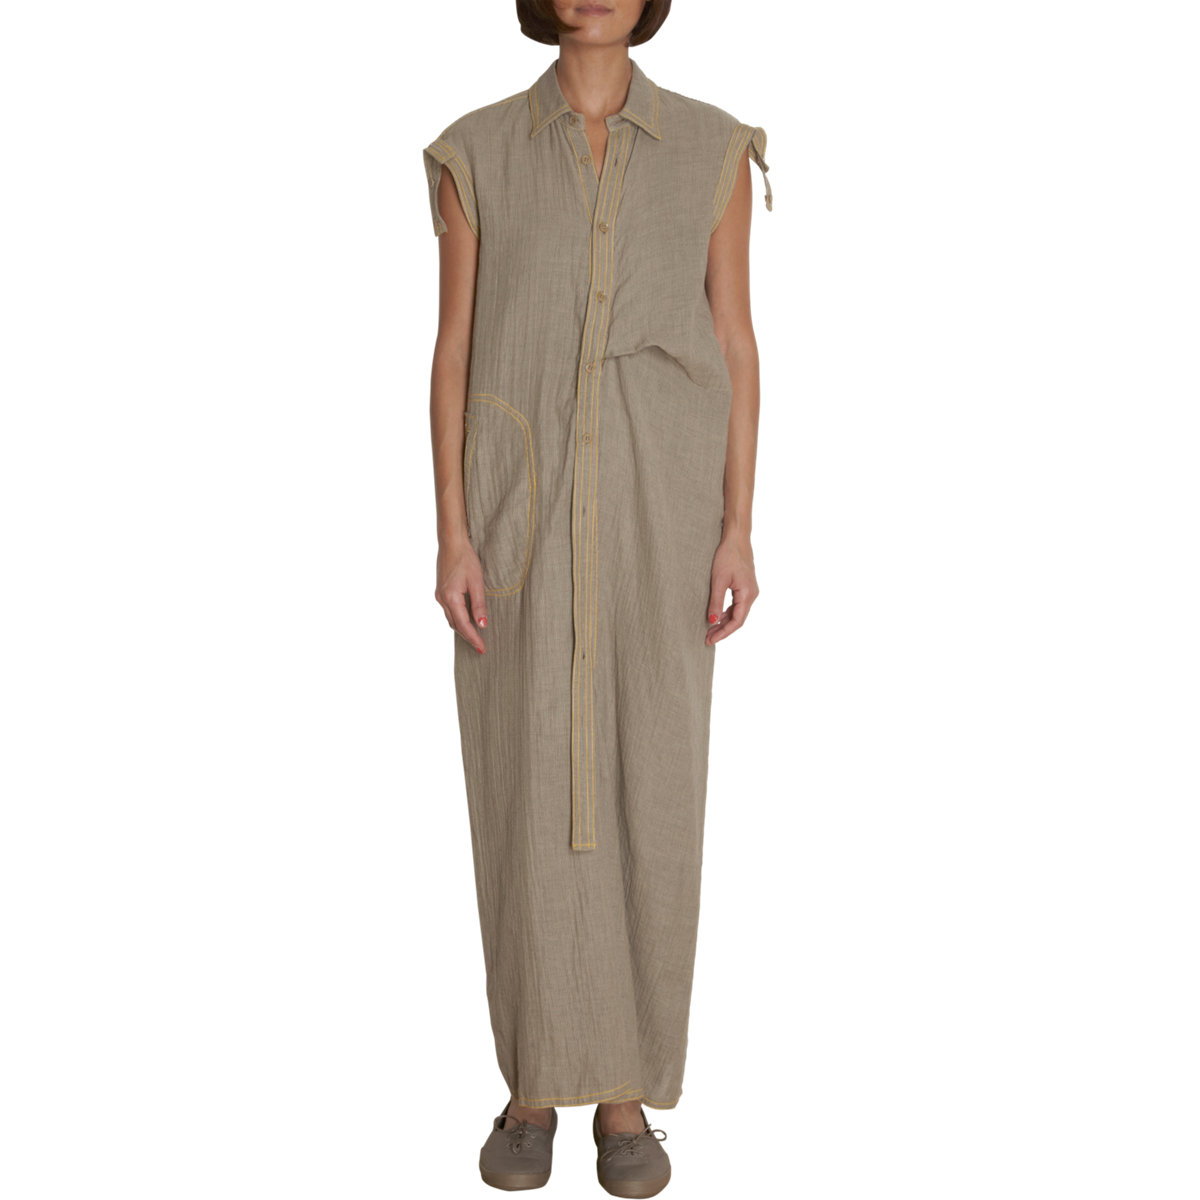 yohji yamamoto one piece jumpsuit in beige brown lyst. Black Bedroom Furniture Sets. Home Design Ideas